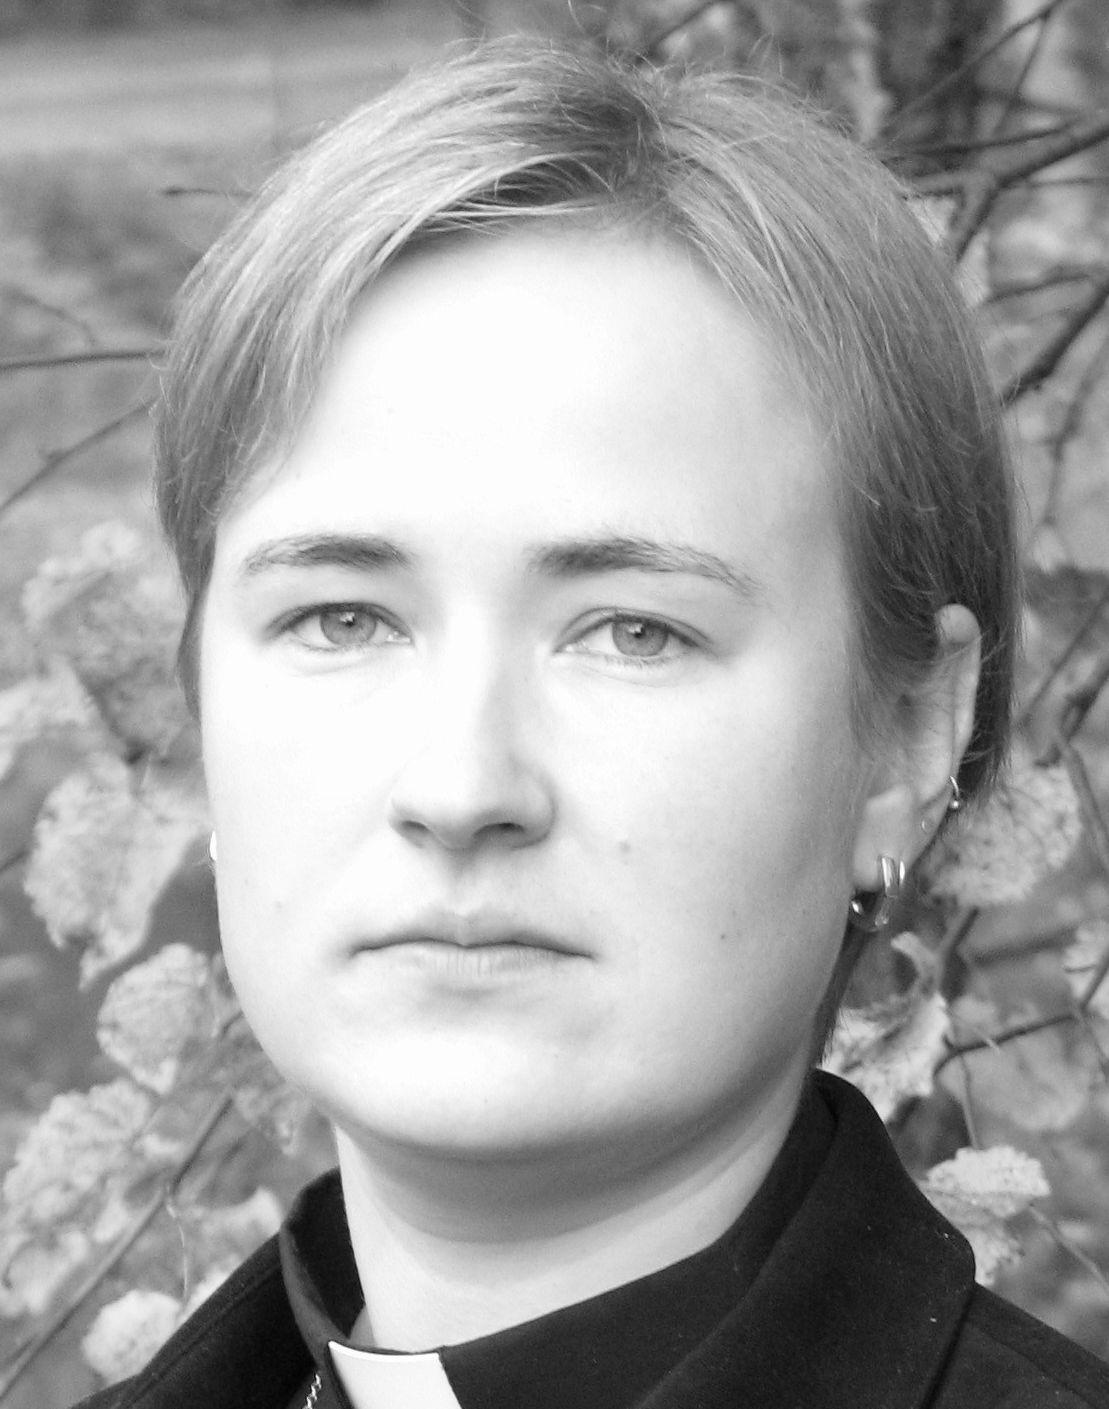 Anna-Liisa Vaher